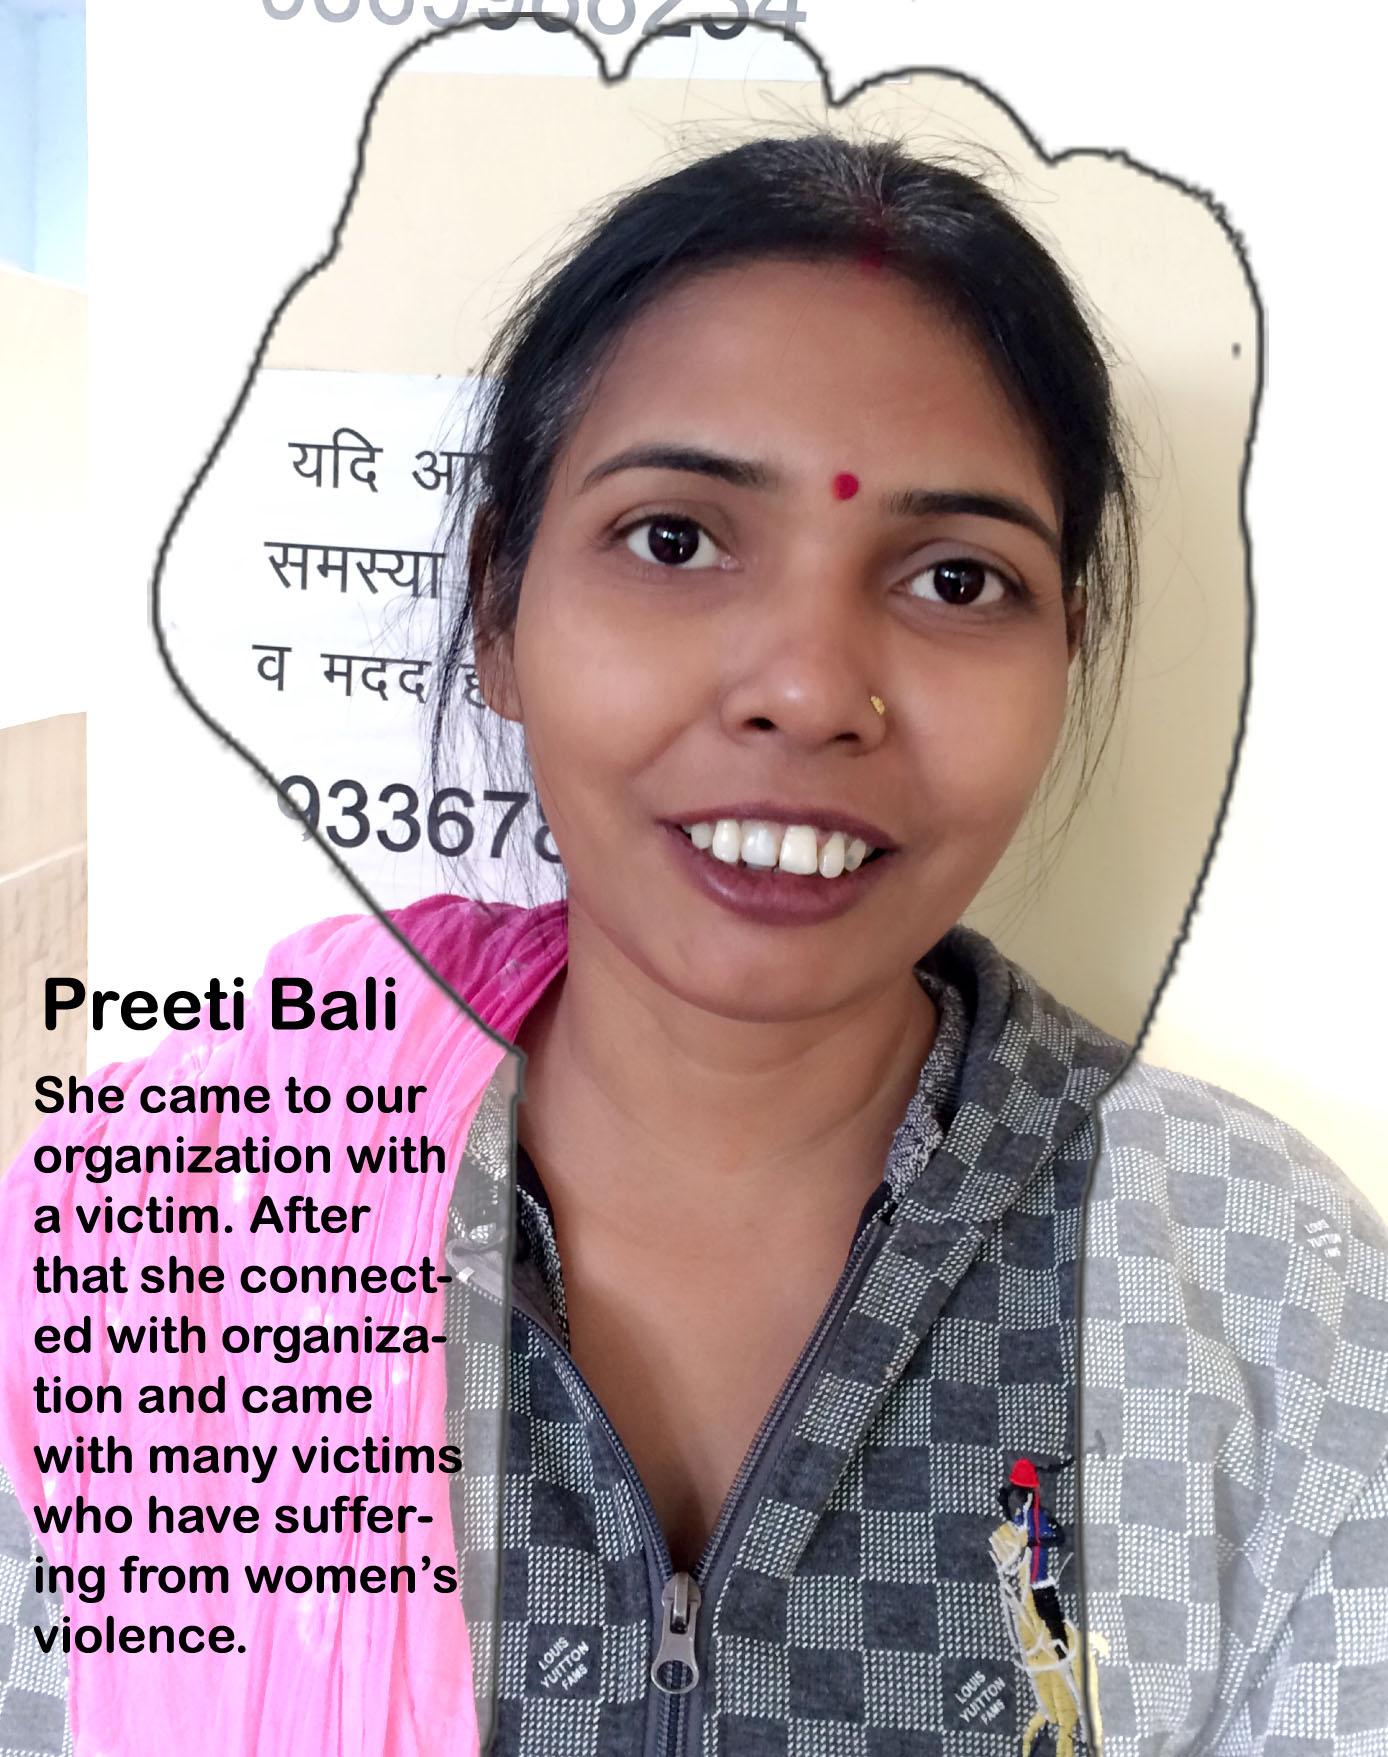 Preeti bali women human right defender--.jpg